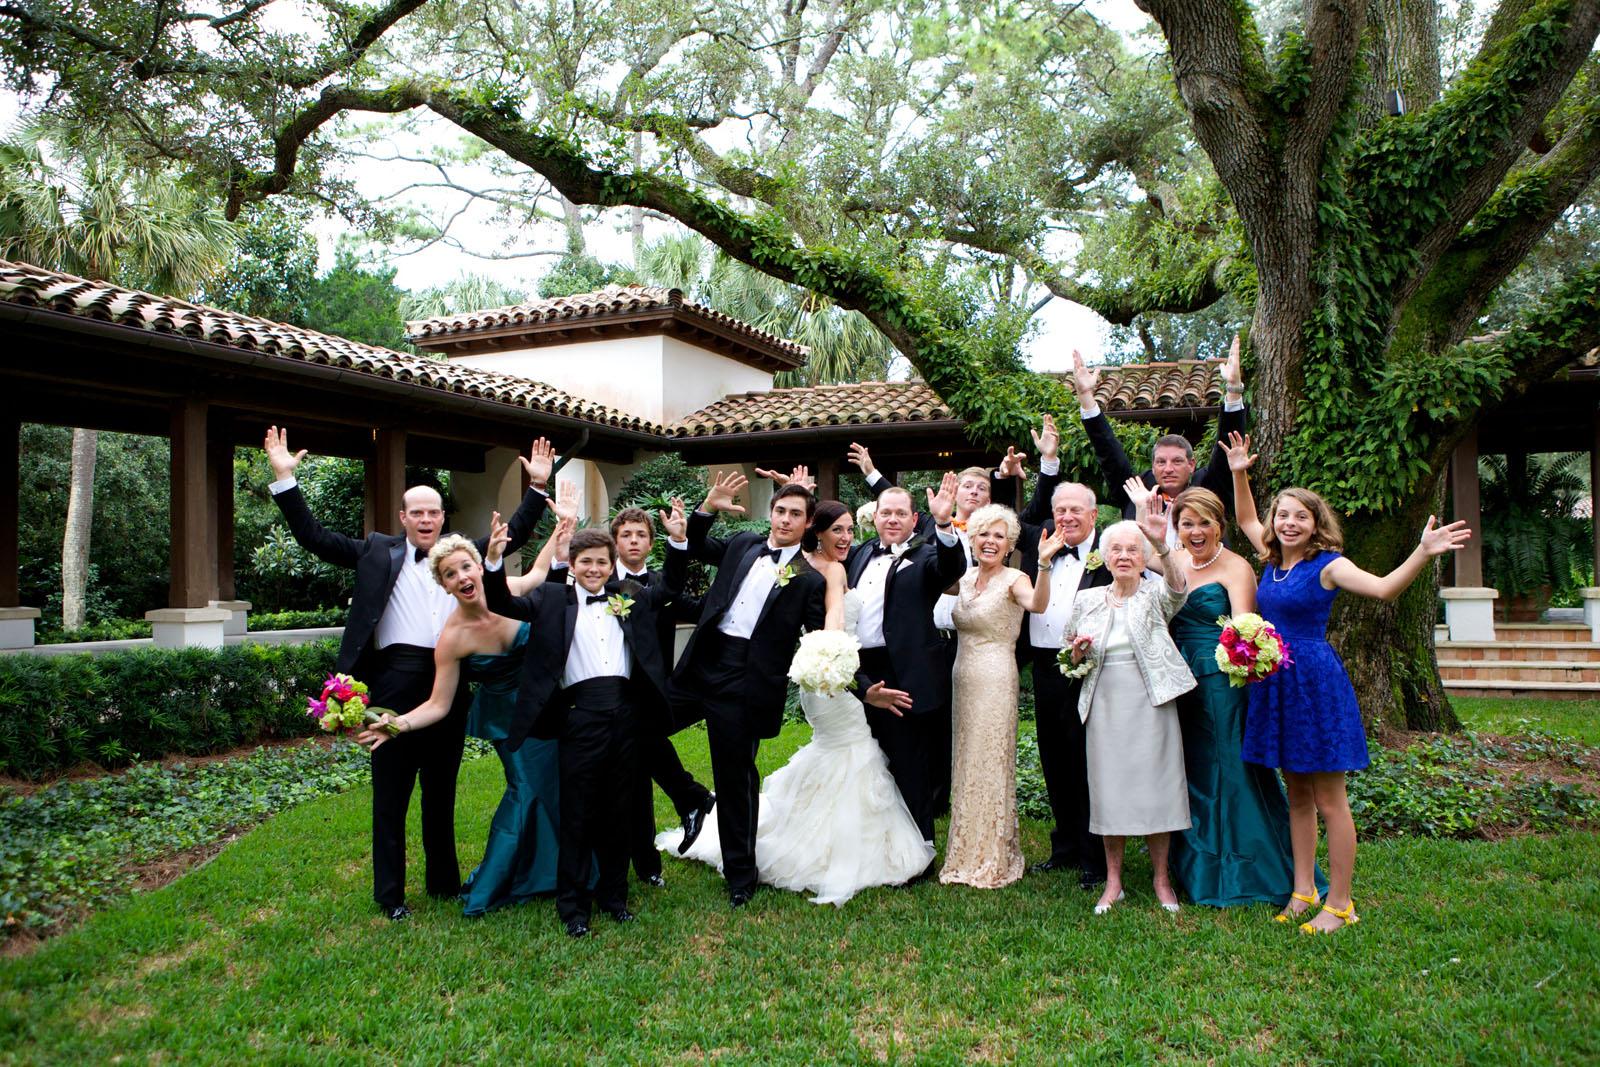 Arden_Photography_Sea_Island_Wedding18.jpg